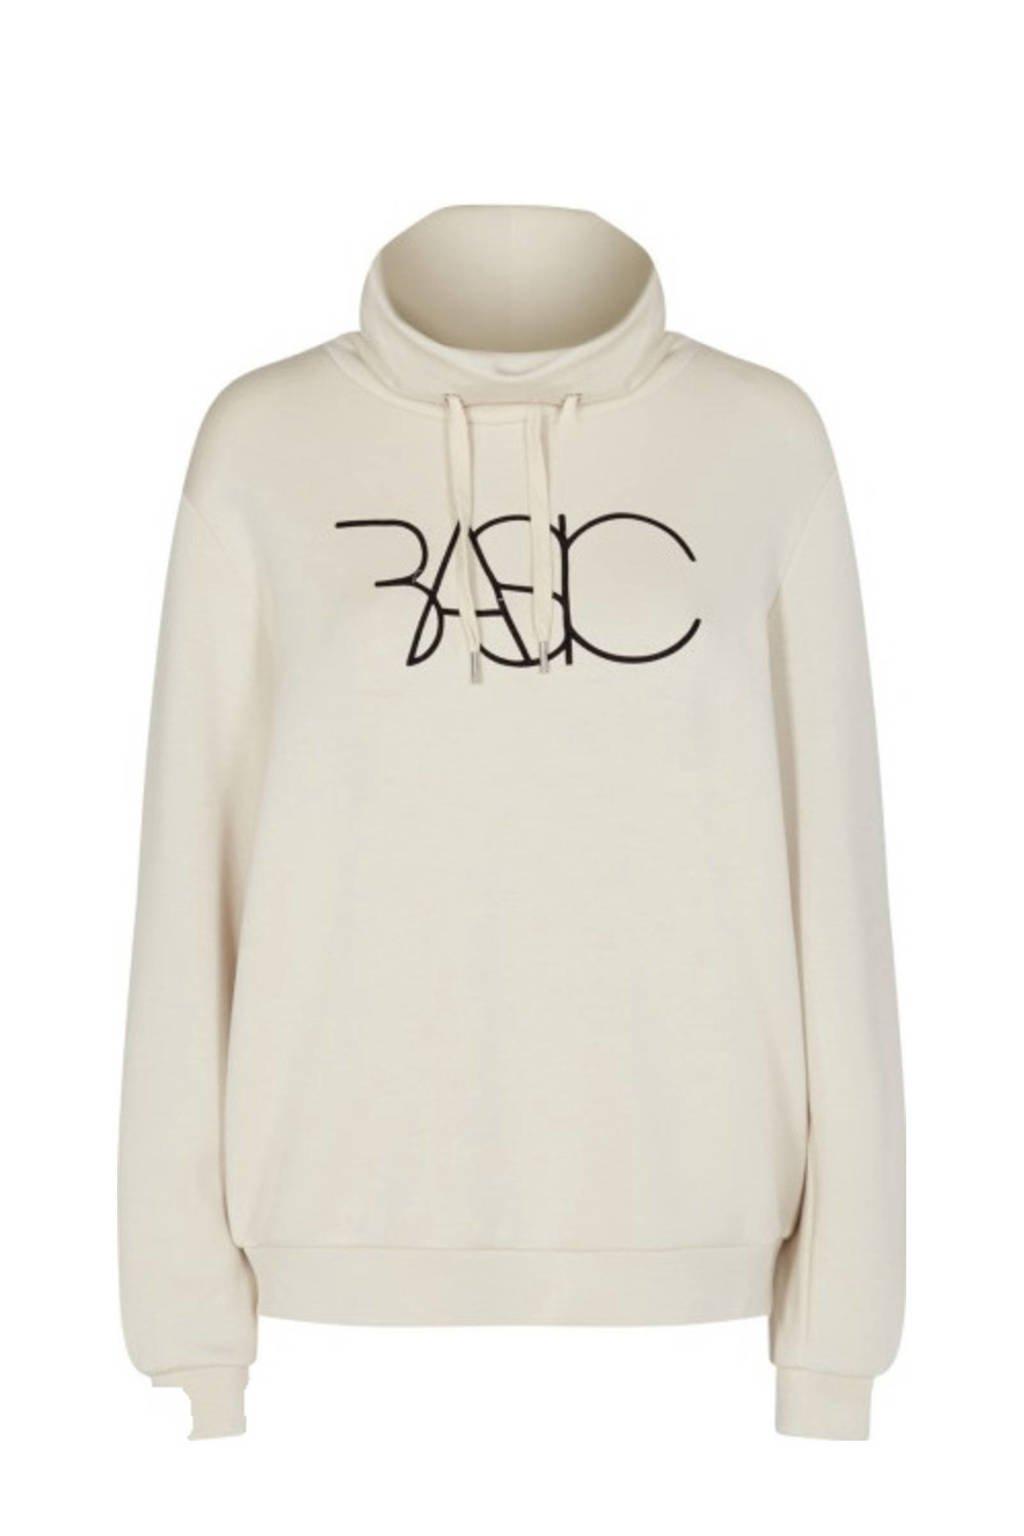 Soyaconcept sweater SC-BANU 22 met tekst offwhite, Offwhite